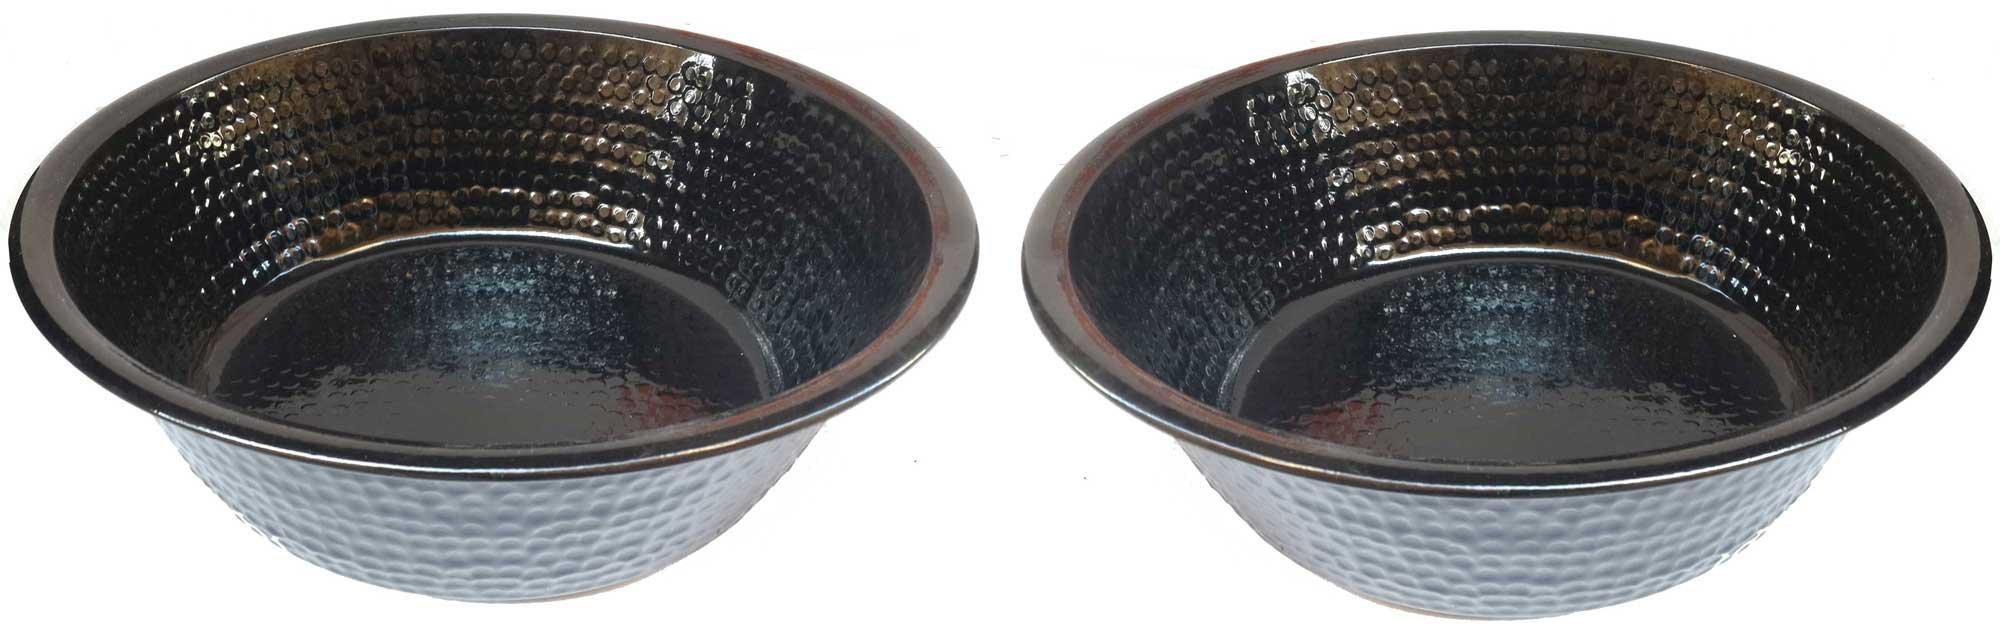 Egypt gift shops Pair Hand Made Metal Pedicure Spa Beauty Salon Foot Soak Bath Wash Massage Therapy Basins Bowls